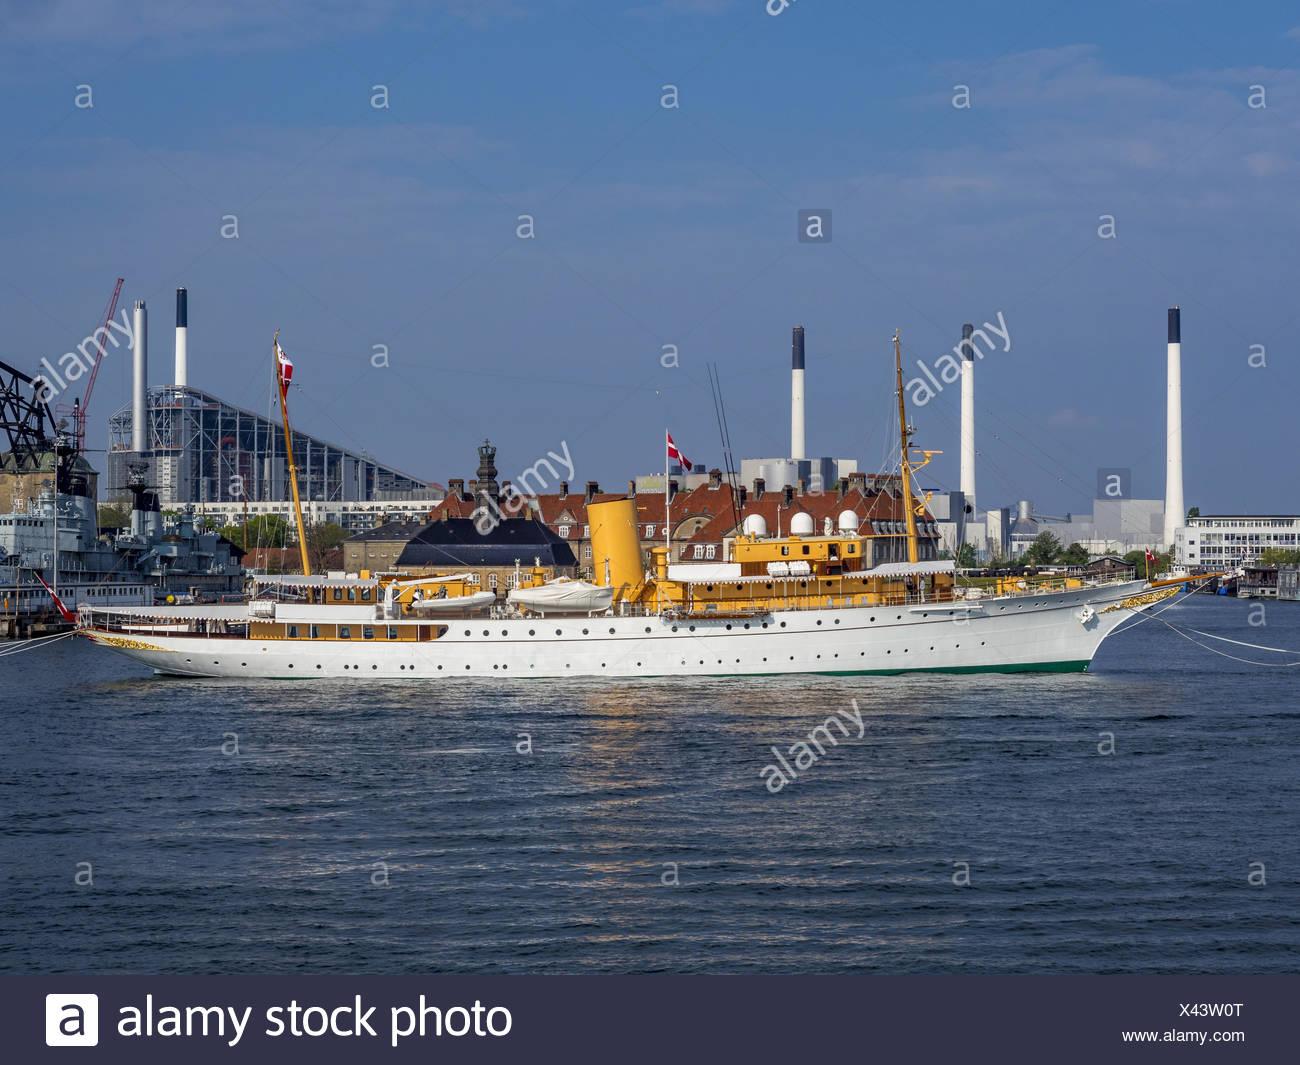 The Danish Royal Yacht Dannebrog, Copenhagen Harbour, Copenhagen, Denmark, Europe - Stock Image